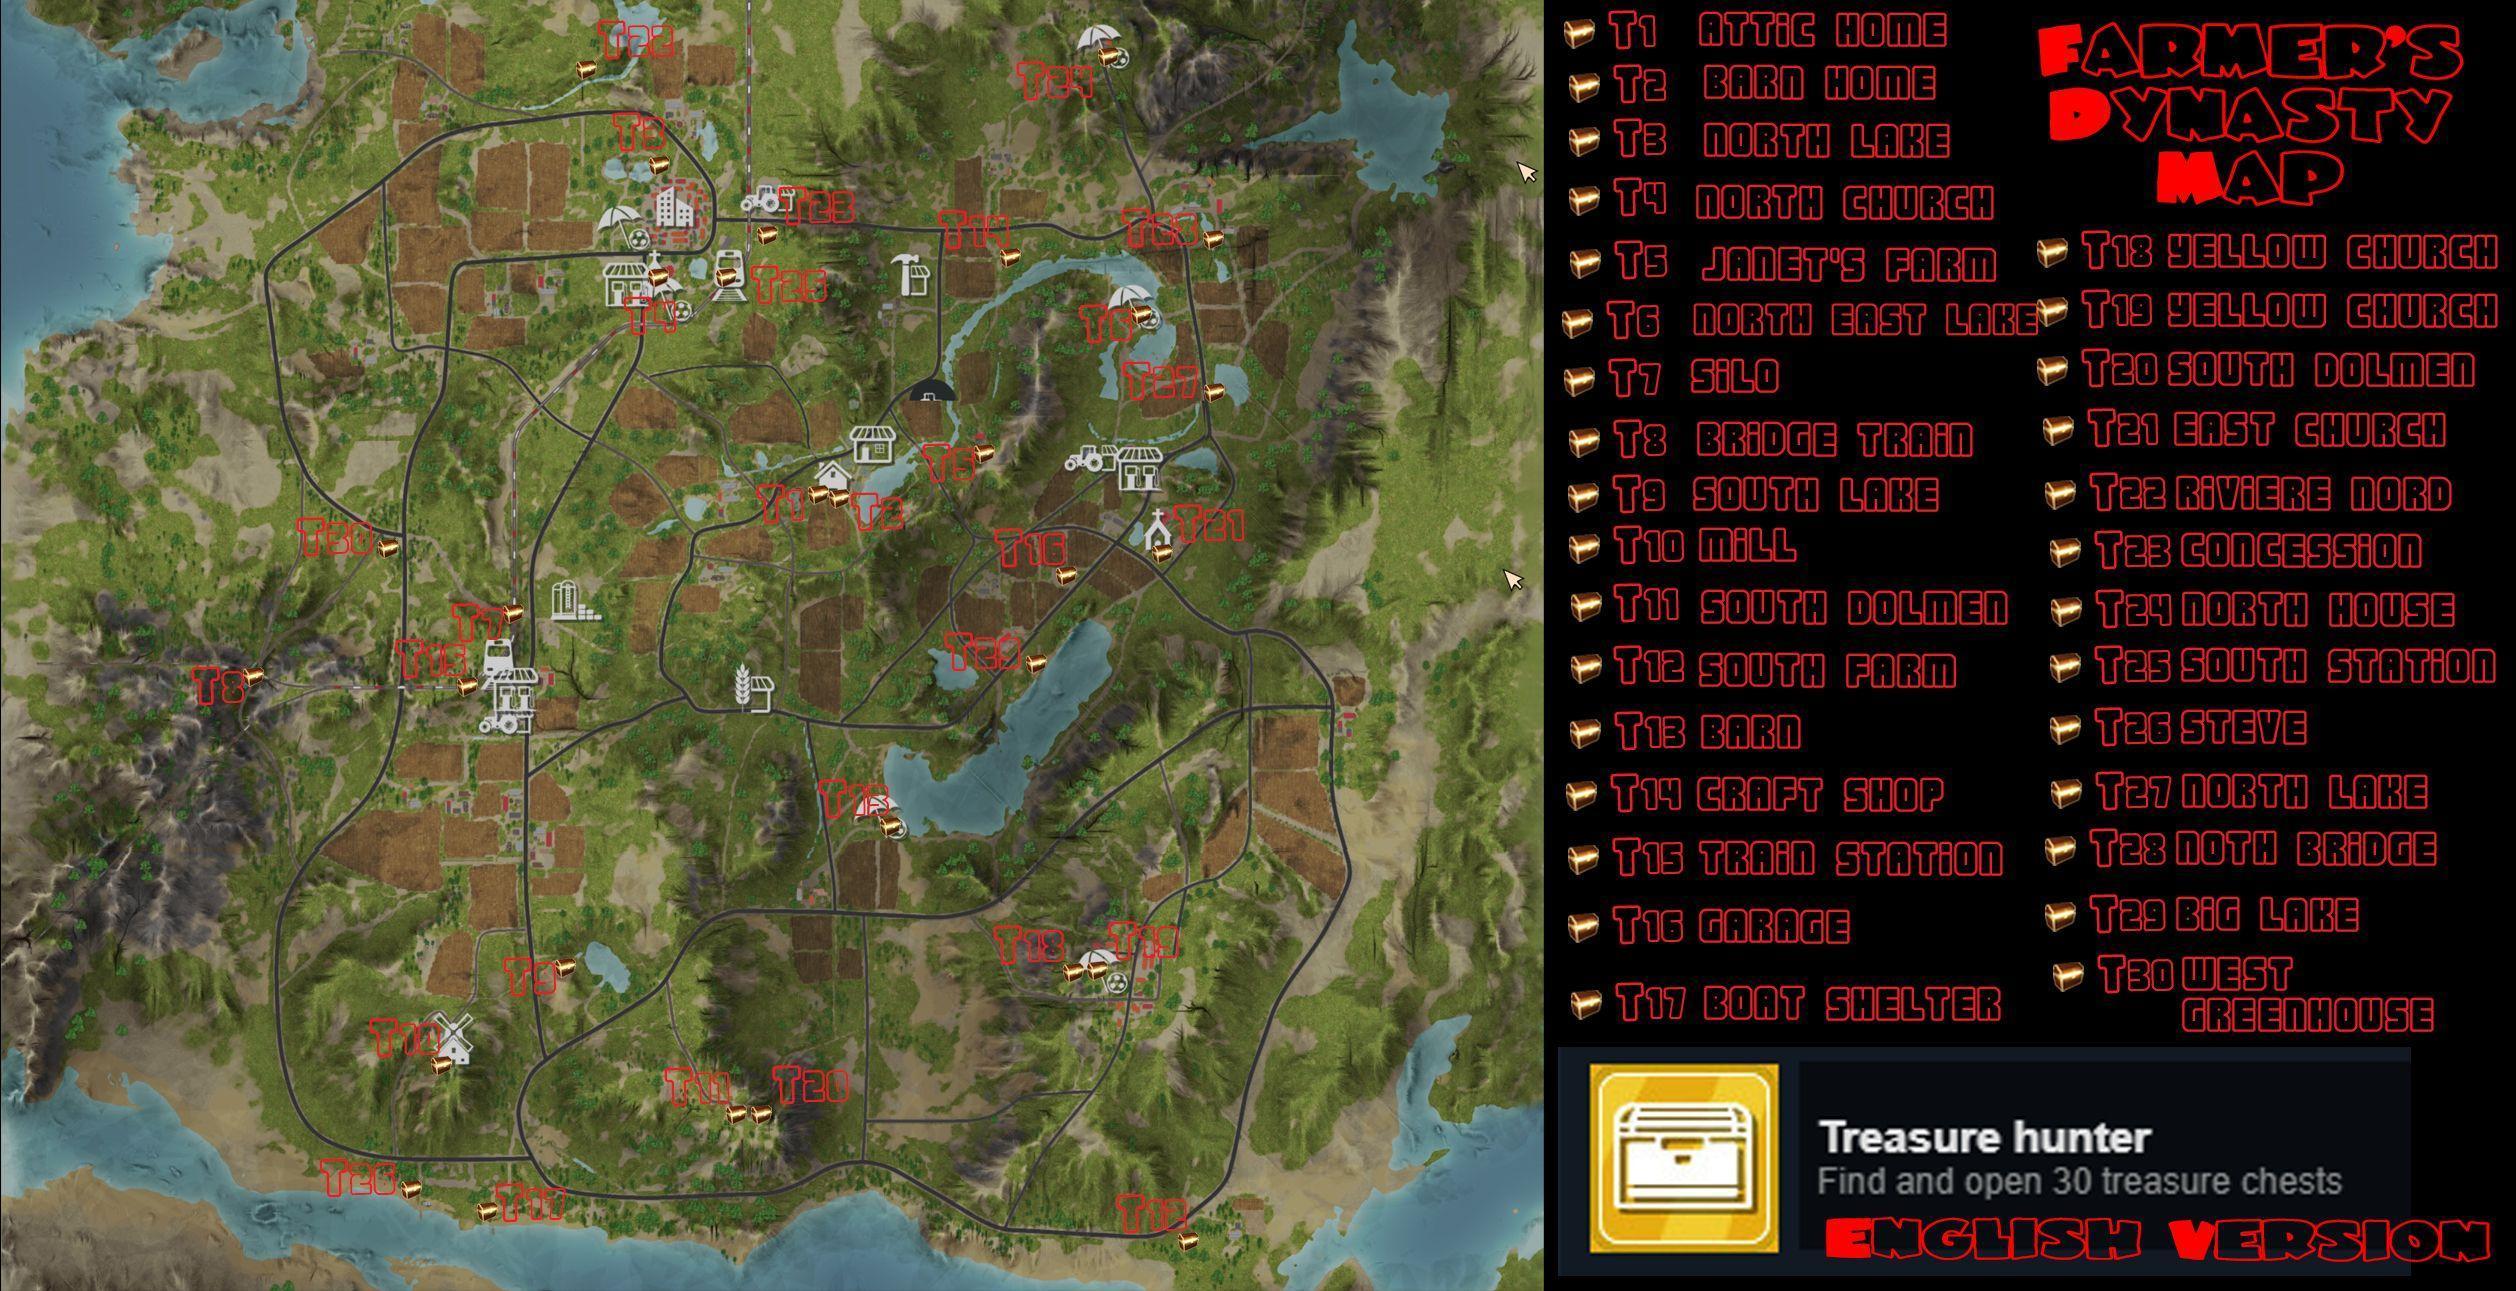 Farmer S Dynasty Treasure Chest Locations